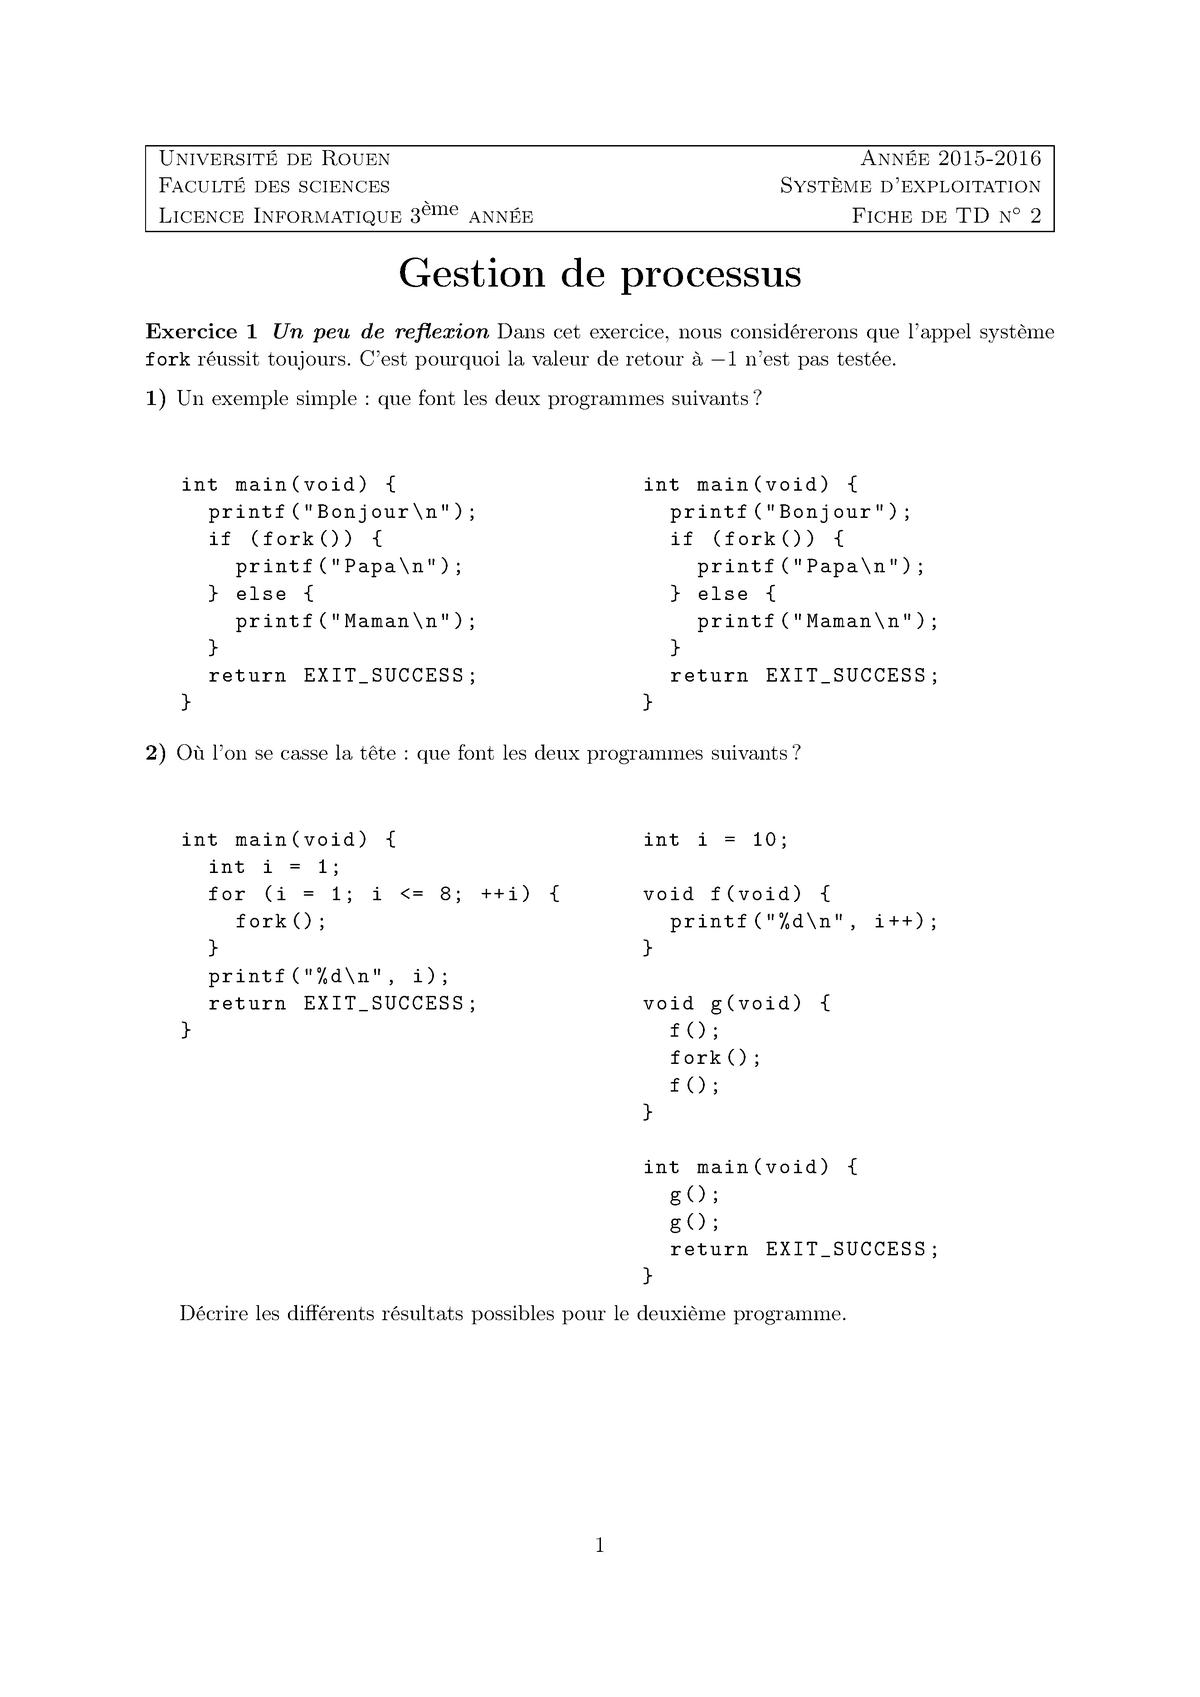 Td2 Tp2 Td Les Elements D Un Systeme D Exploitation Studocu